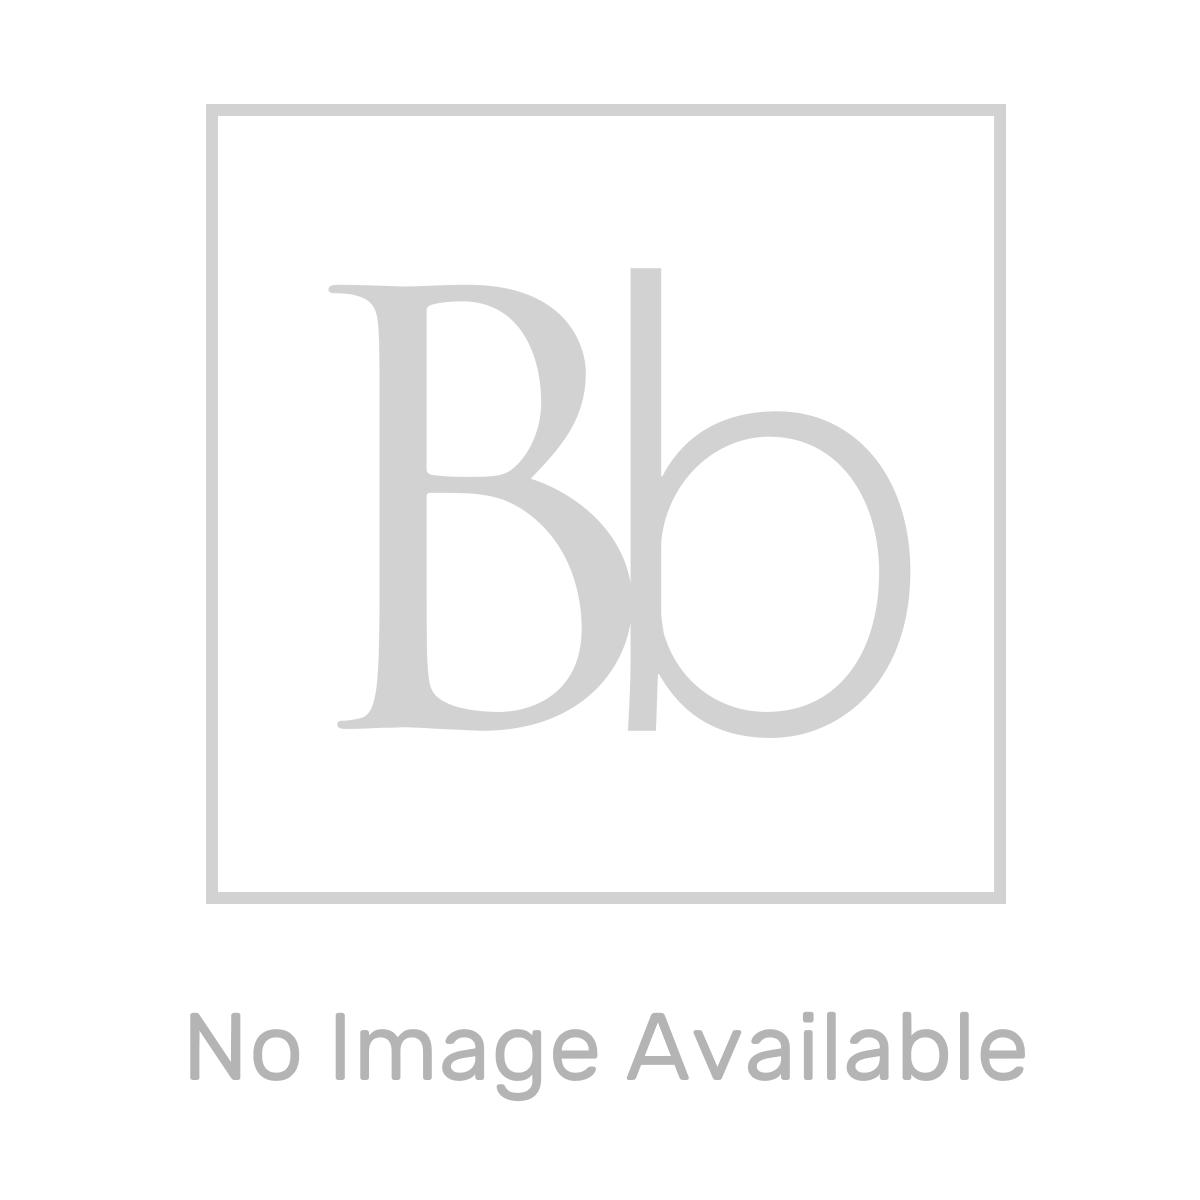 RAK Ecofix Slimline Concealed Cistern 480 x 375mm Dimensions